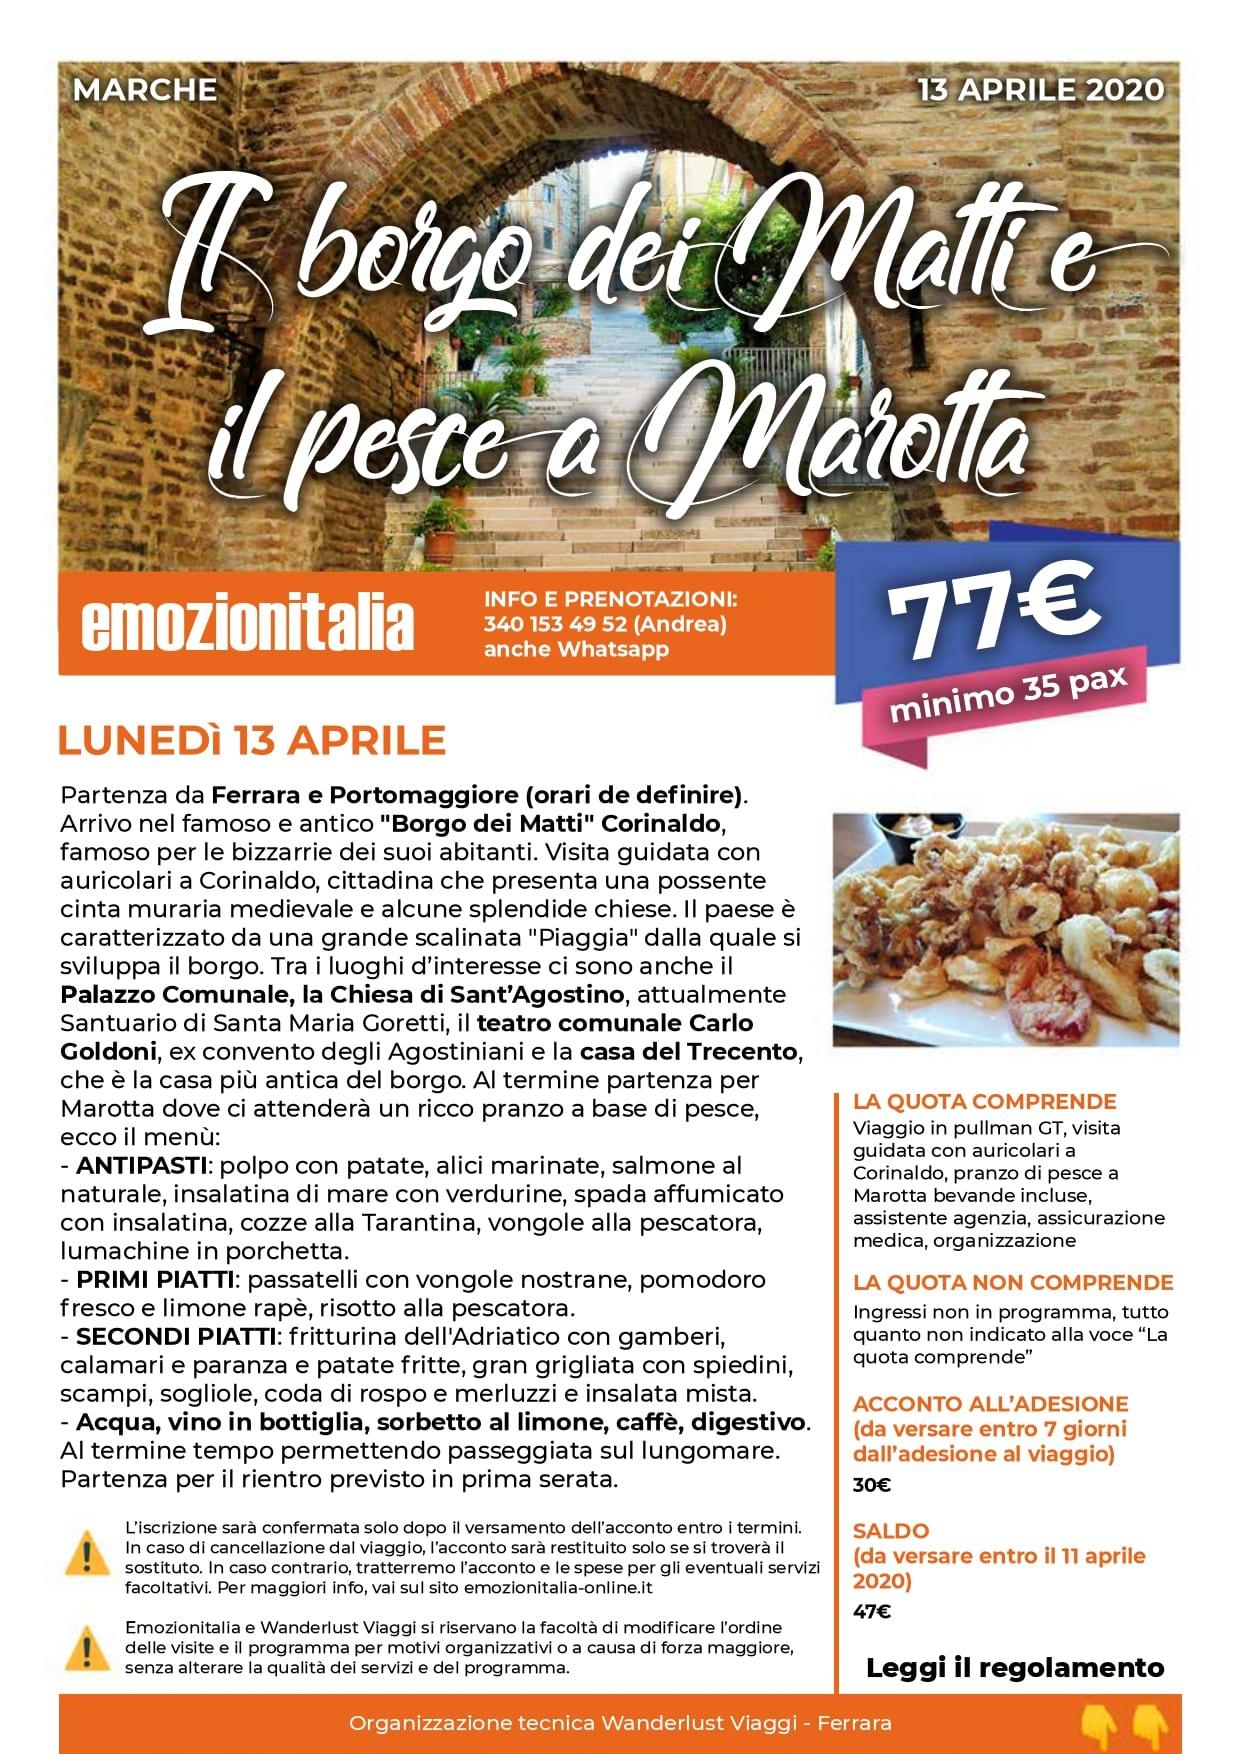 Corinaldo-Marotta_page-0001